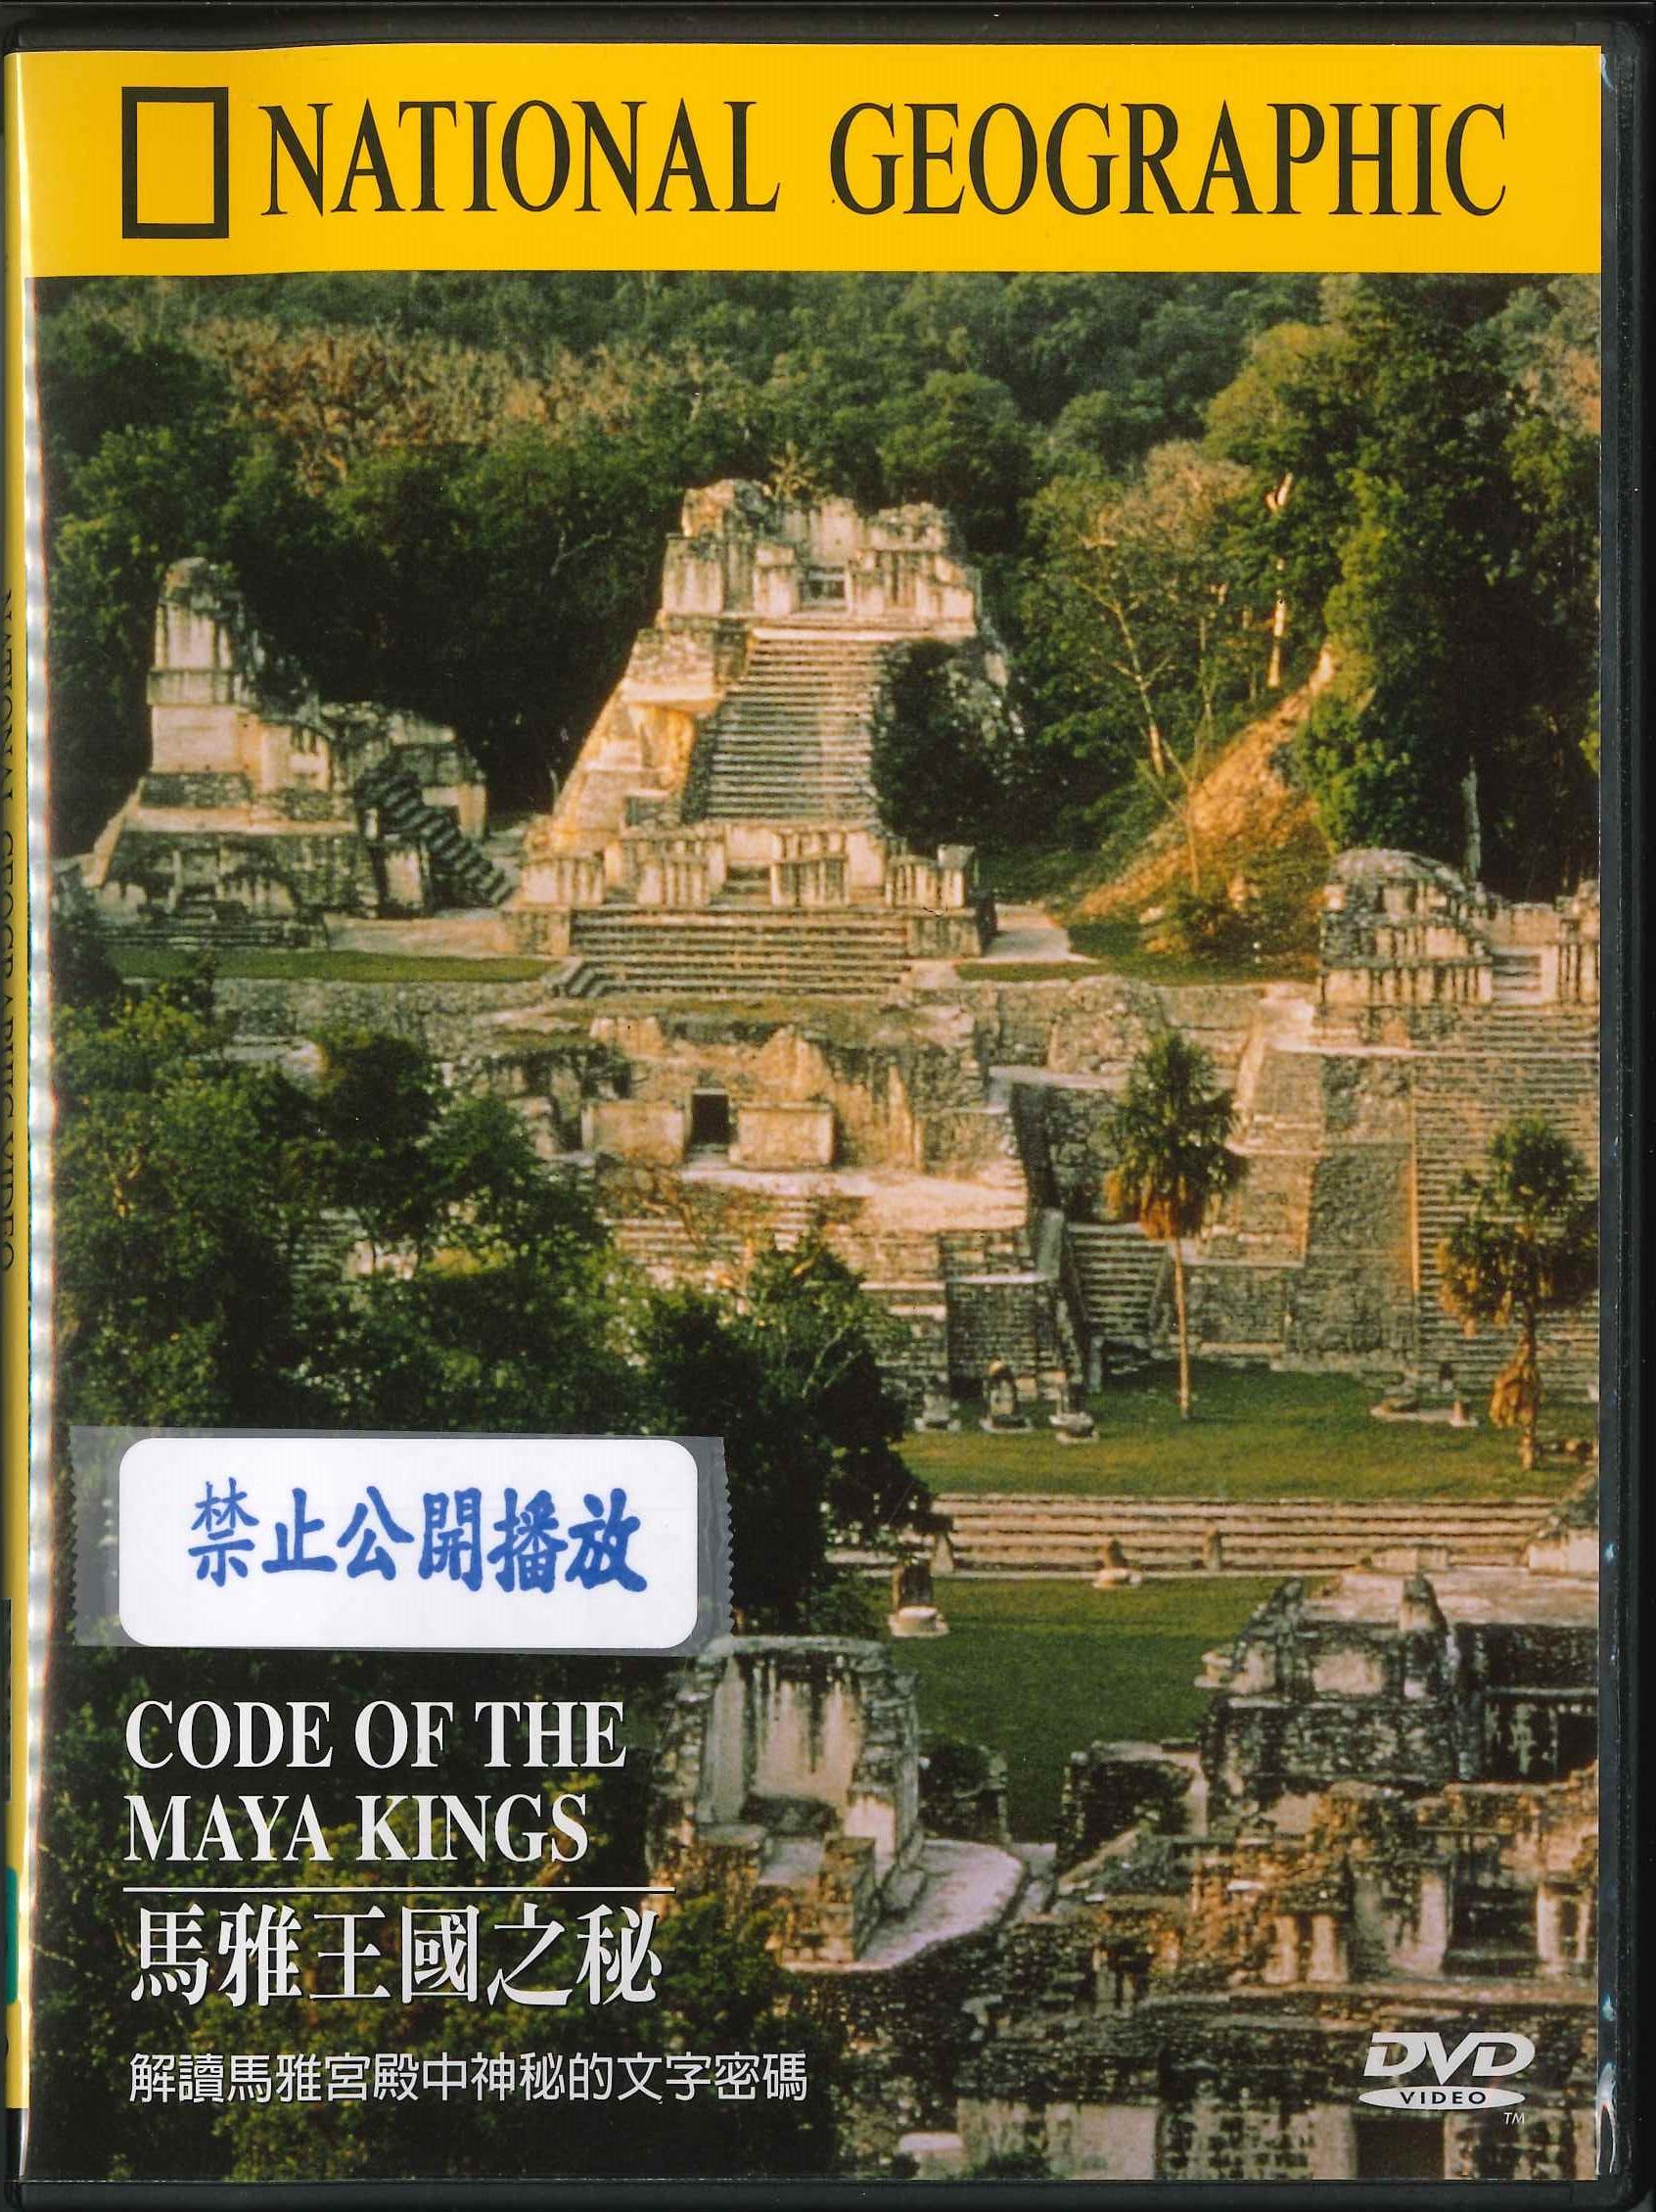 馬雅王國之秘 [錄影資料]=Code of the Maya kings